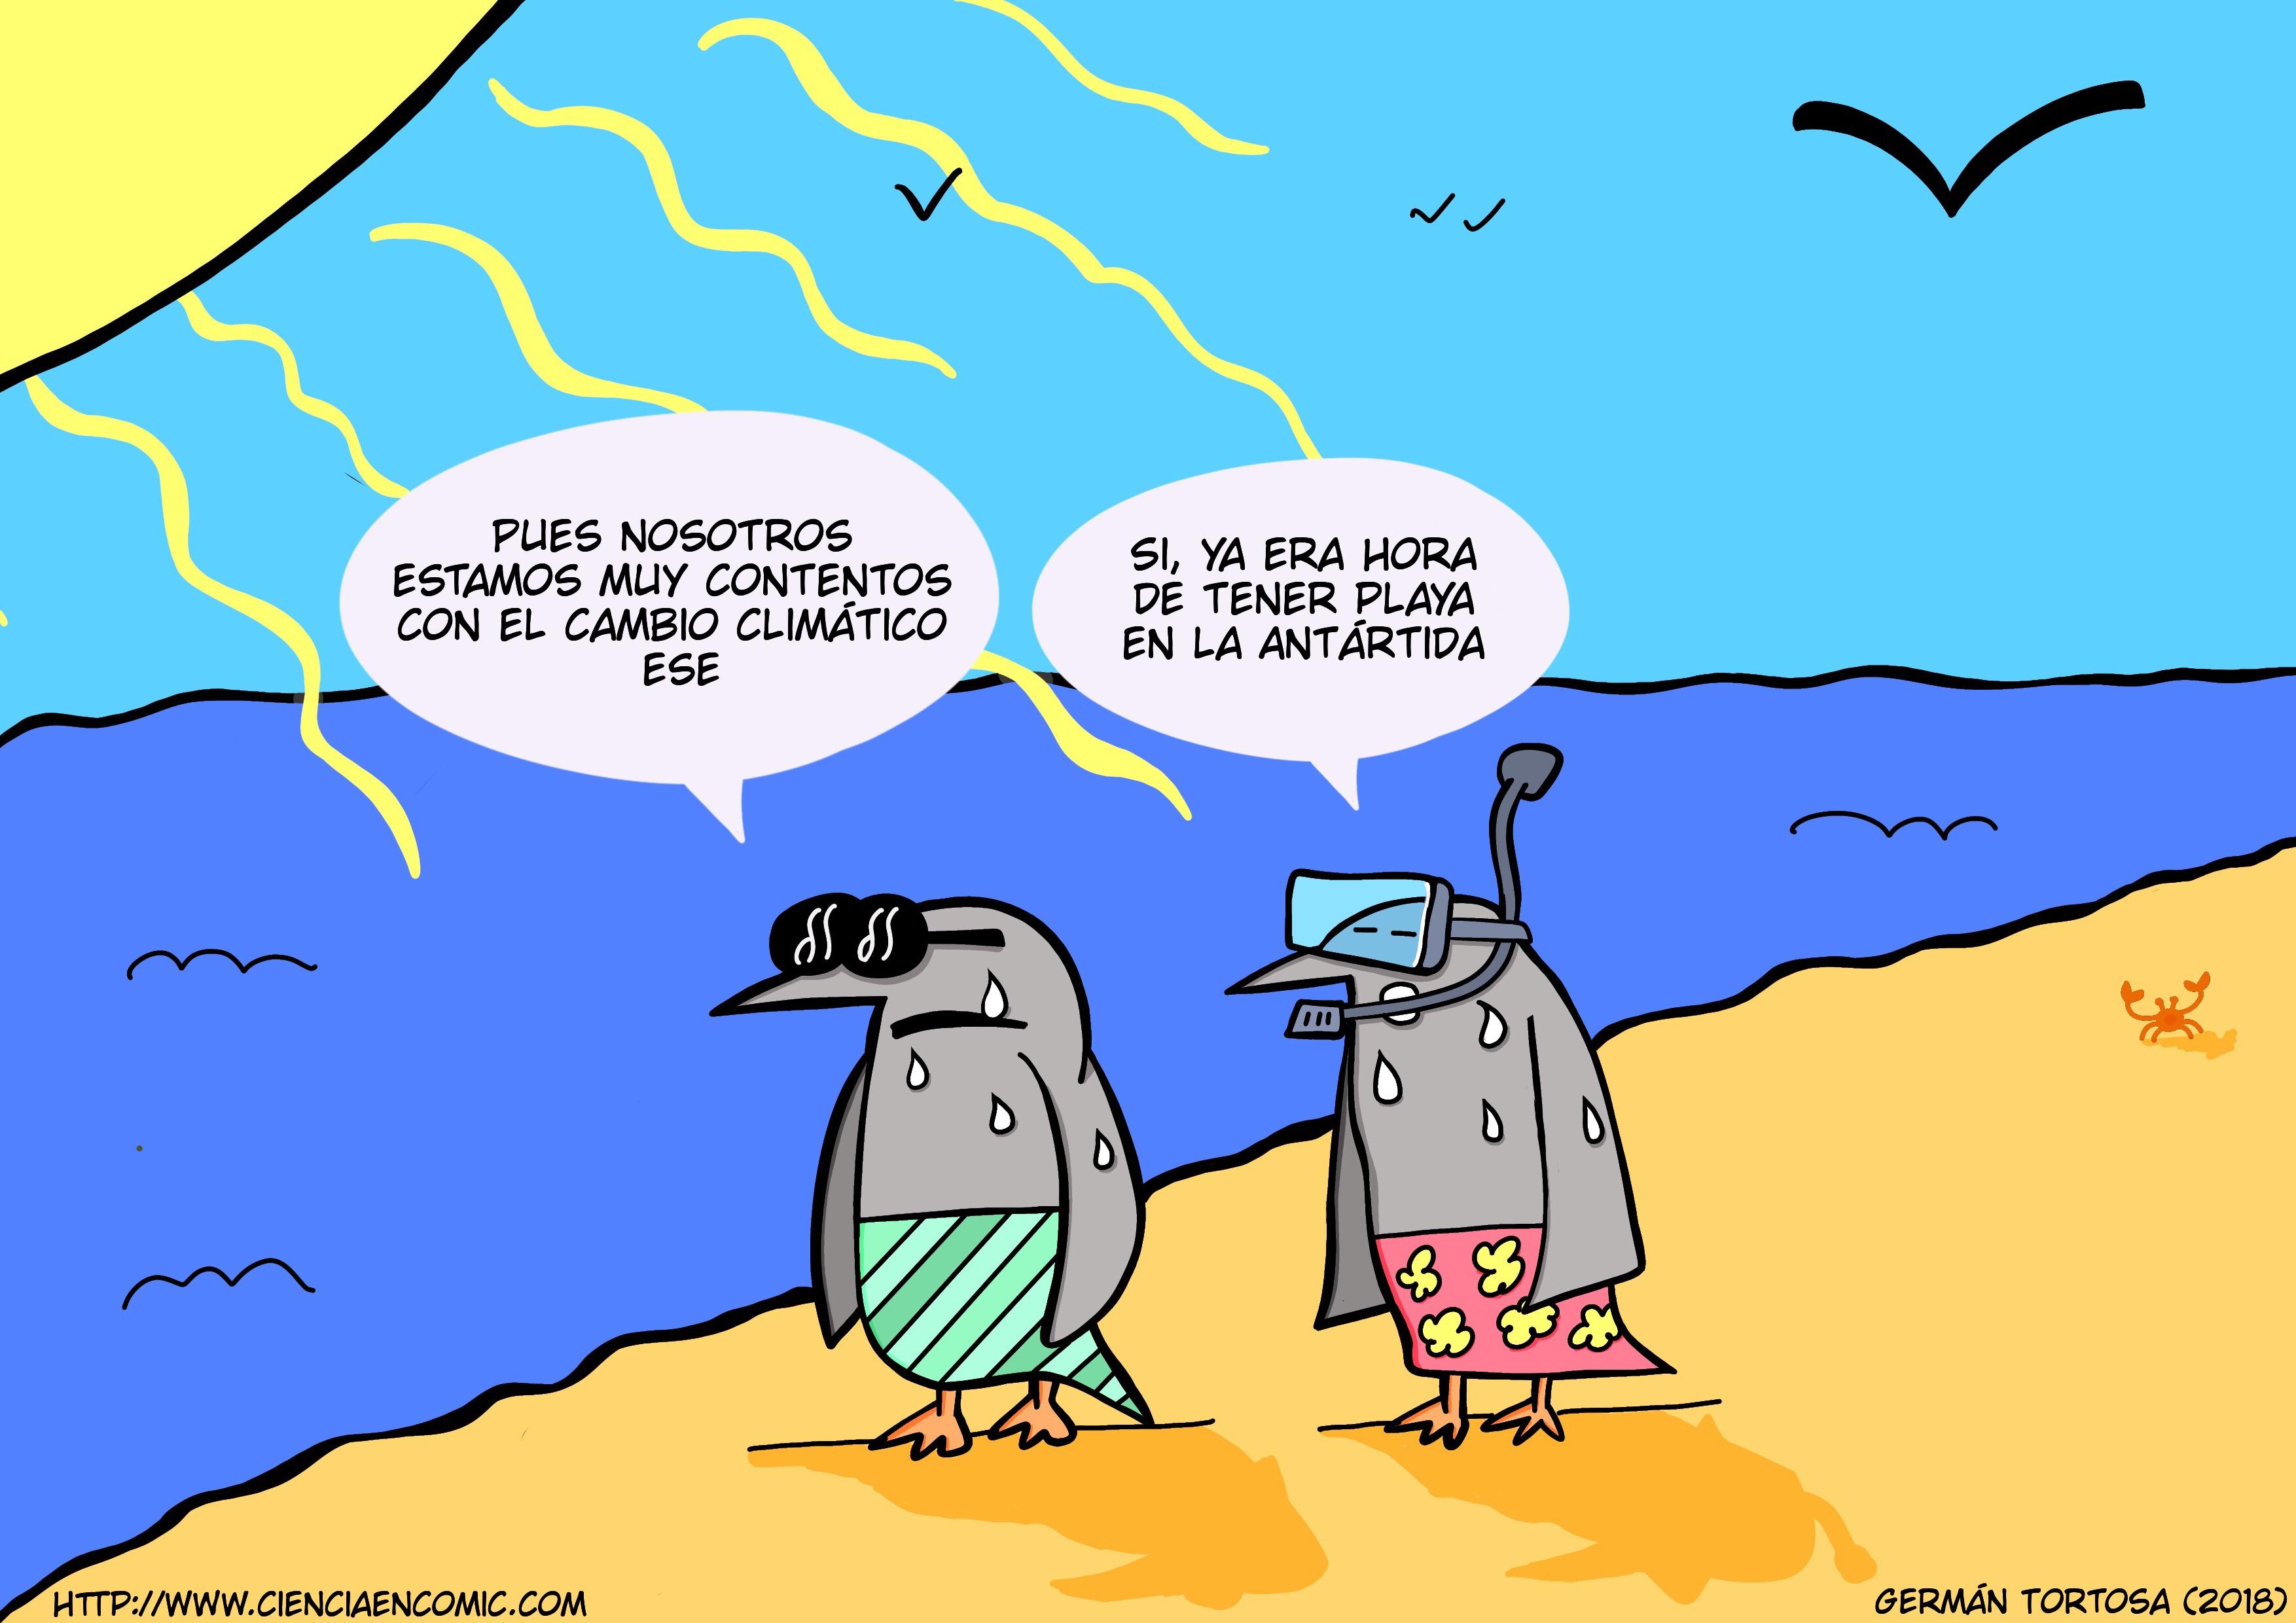 Los pingüinos quieren playa